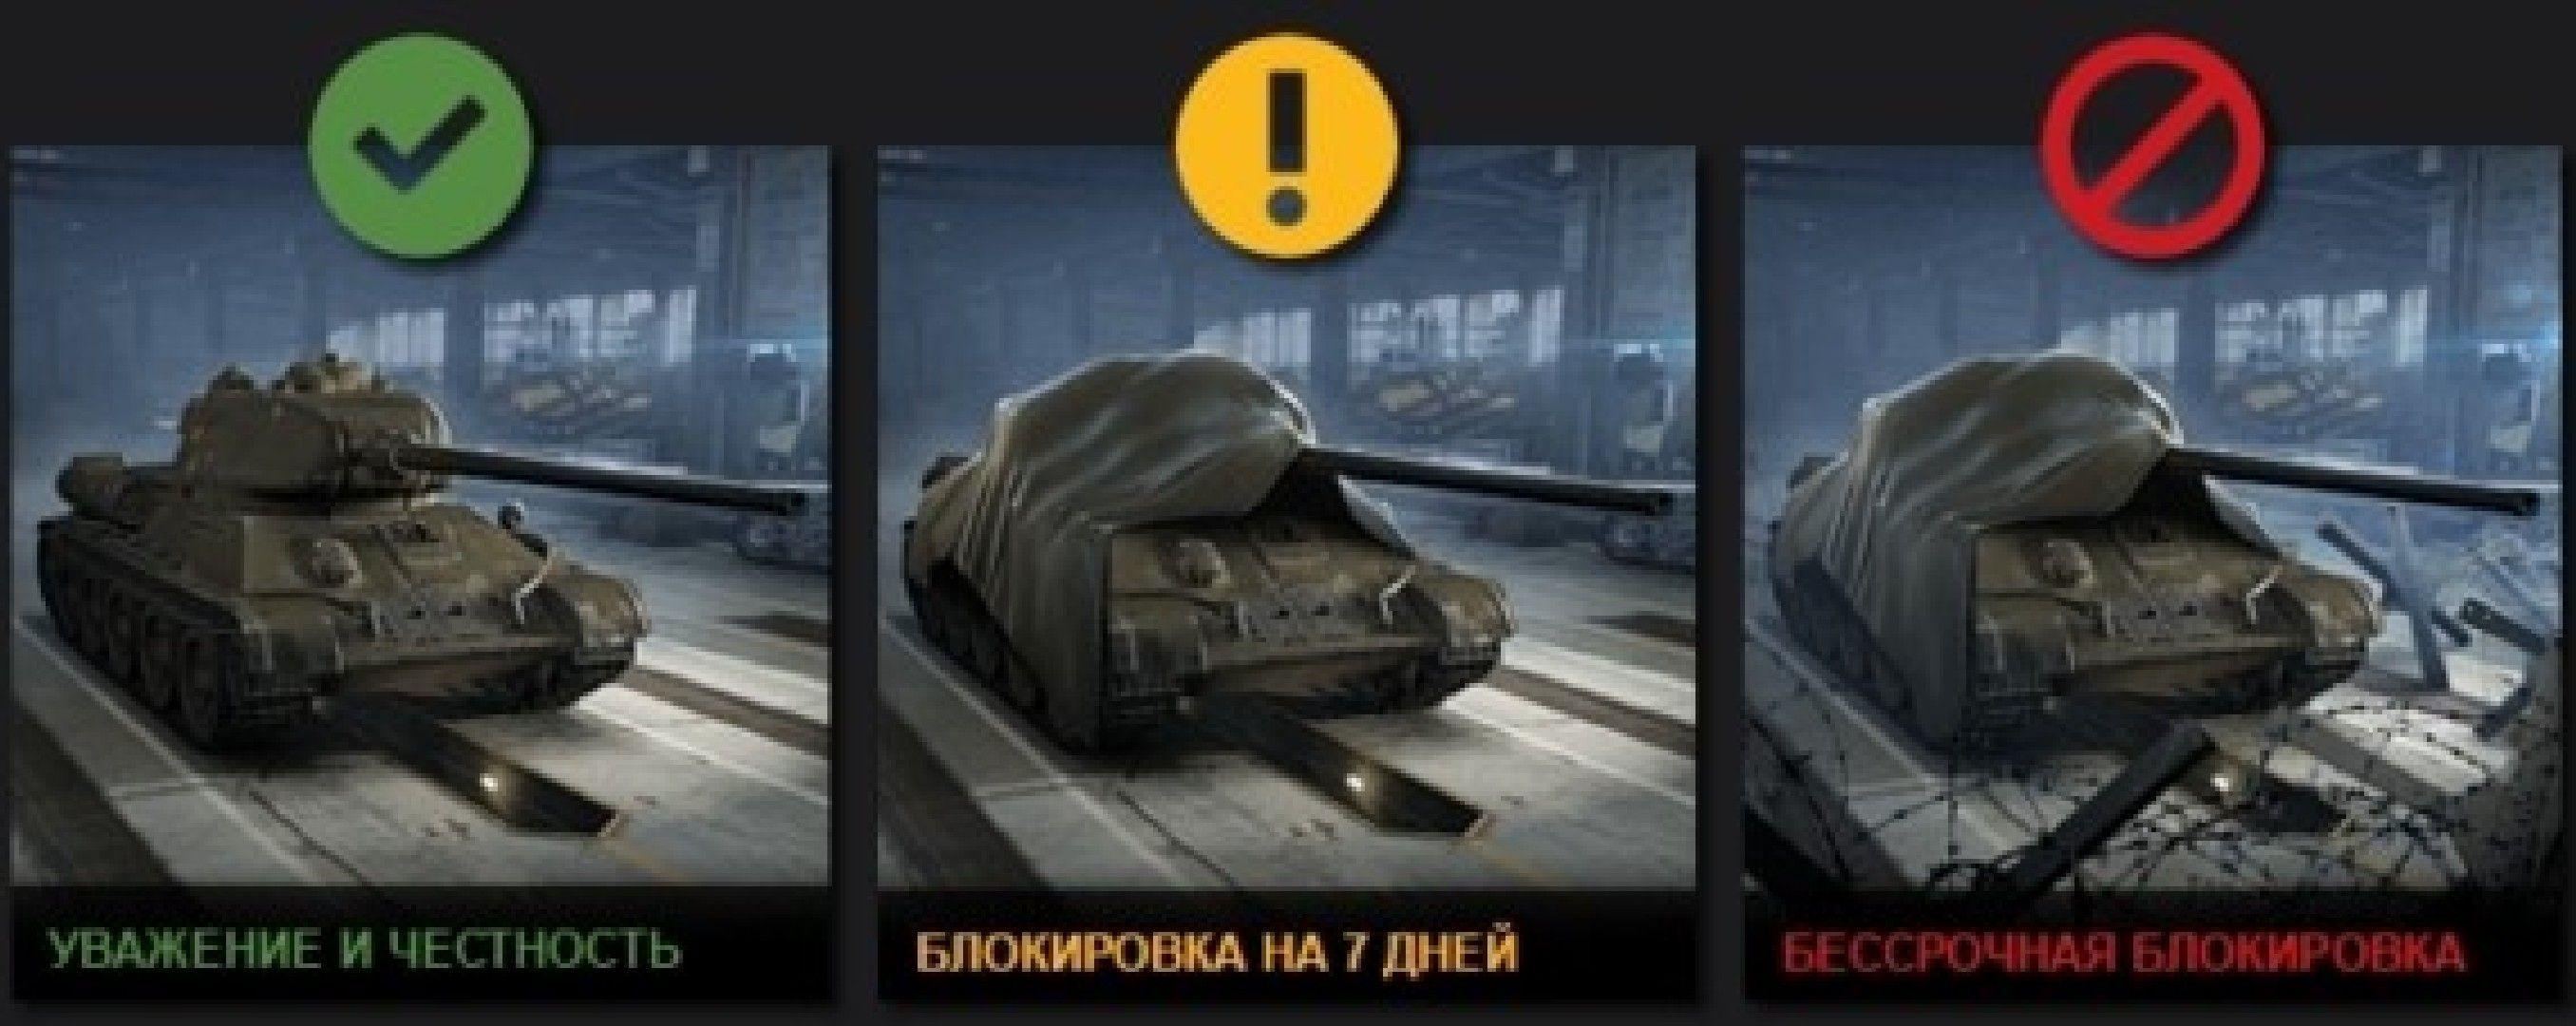 Какие моды World of Tanks запрещены